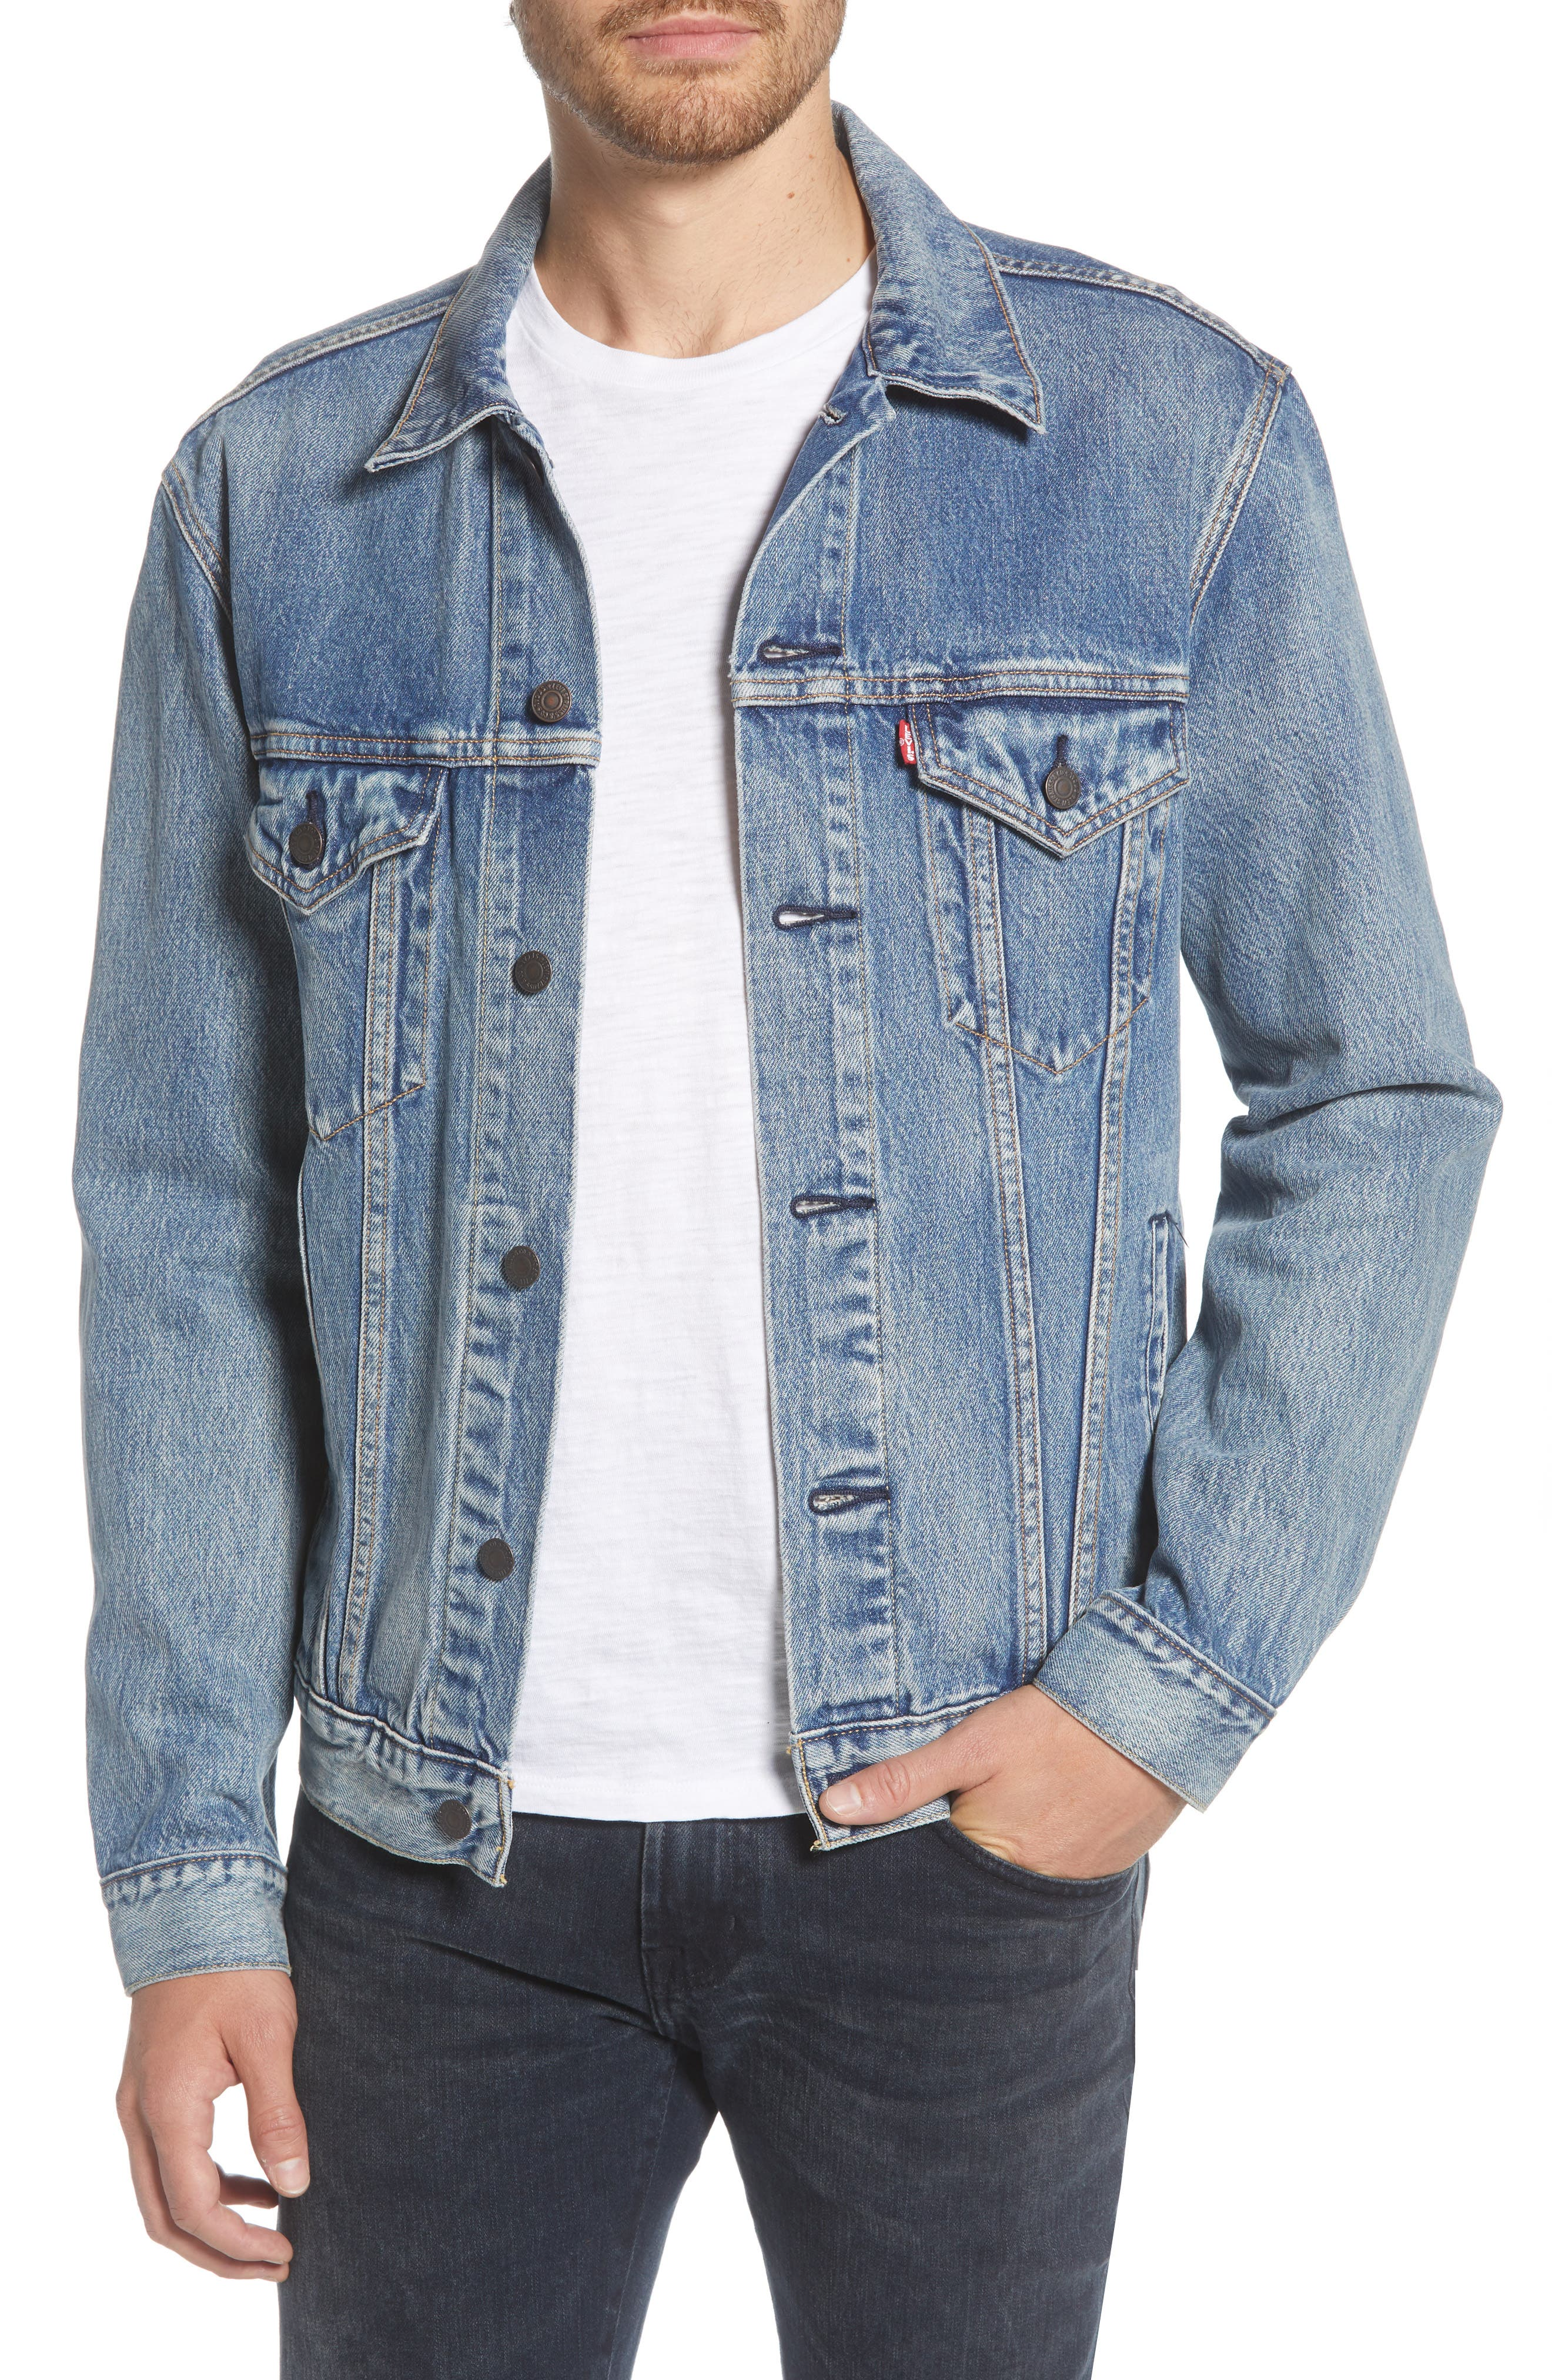 New Women/'s Top Wool Look Denim Stretch Jeans Cardigan Overcoat Vintage Jacket